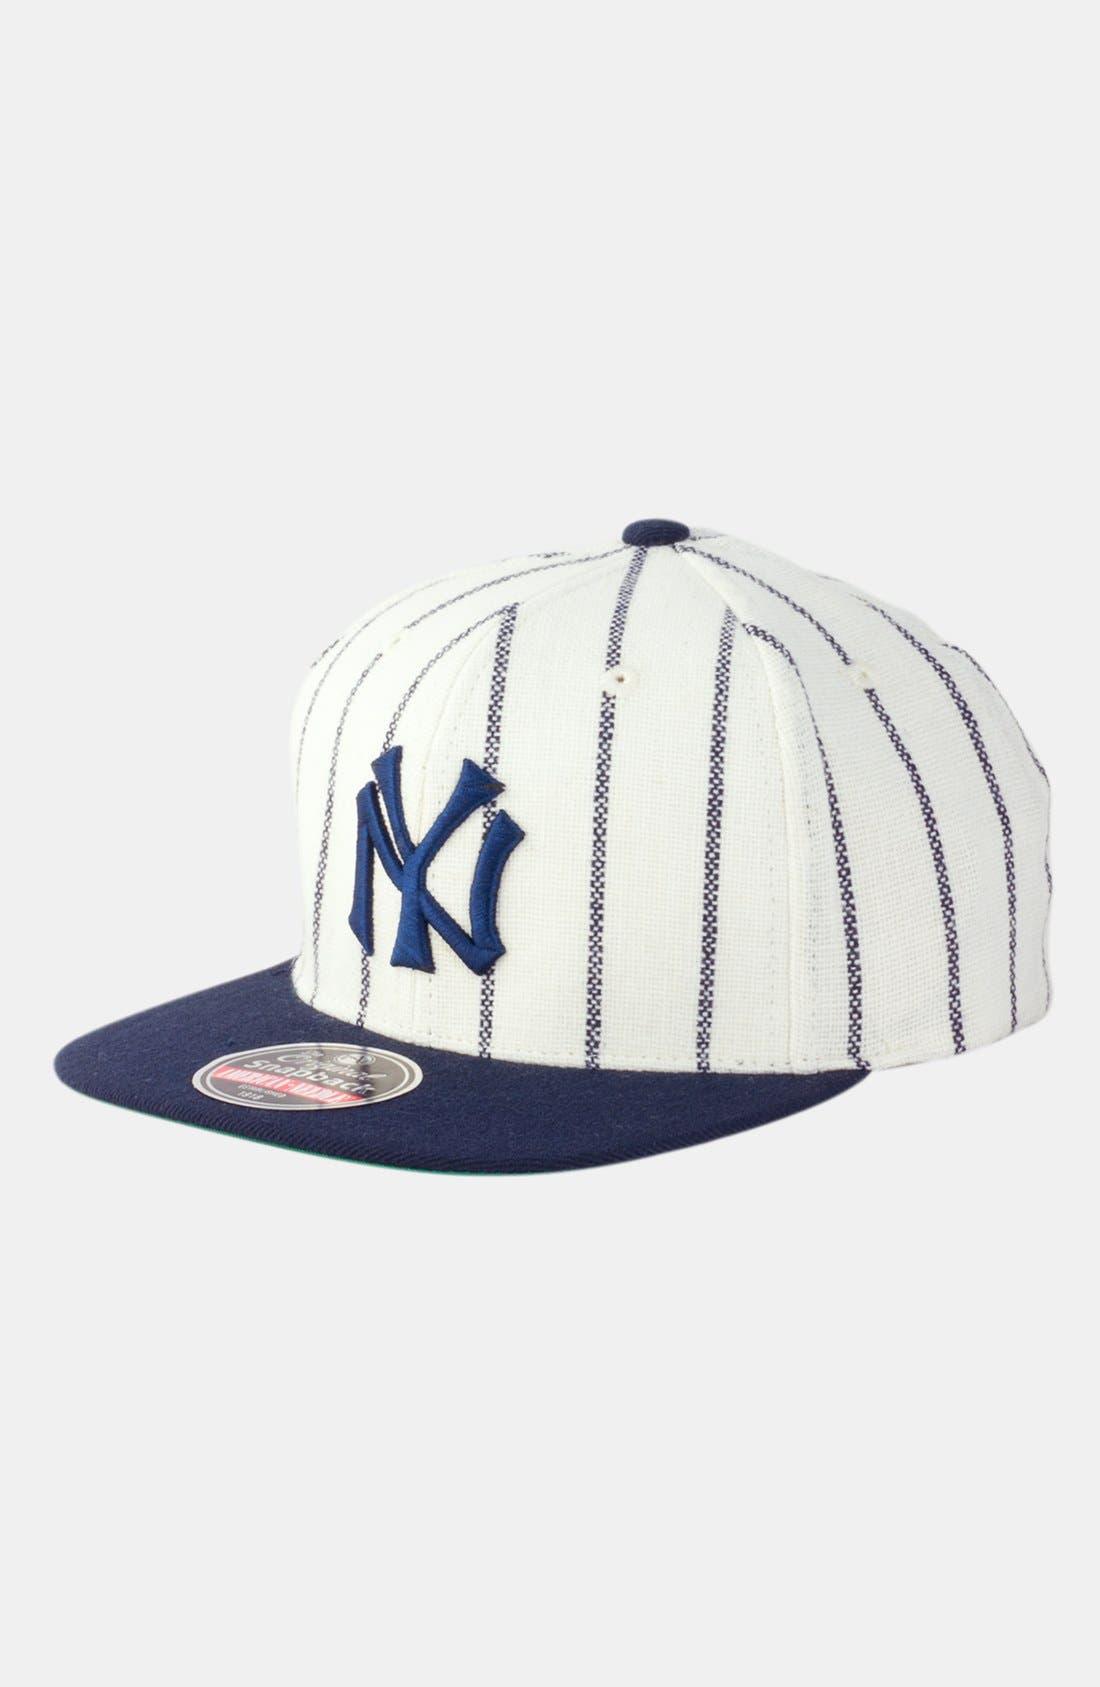 Alternate Image 1 Selected - American Needle 'New York Yankees 1921 - 400 Series' Snapback Baseball Cap